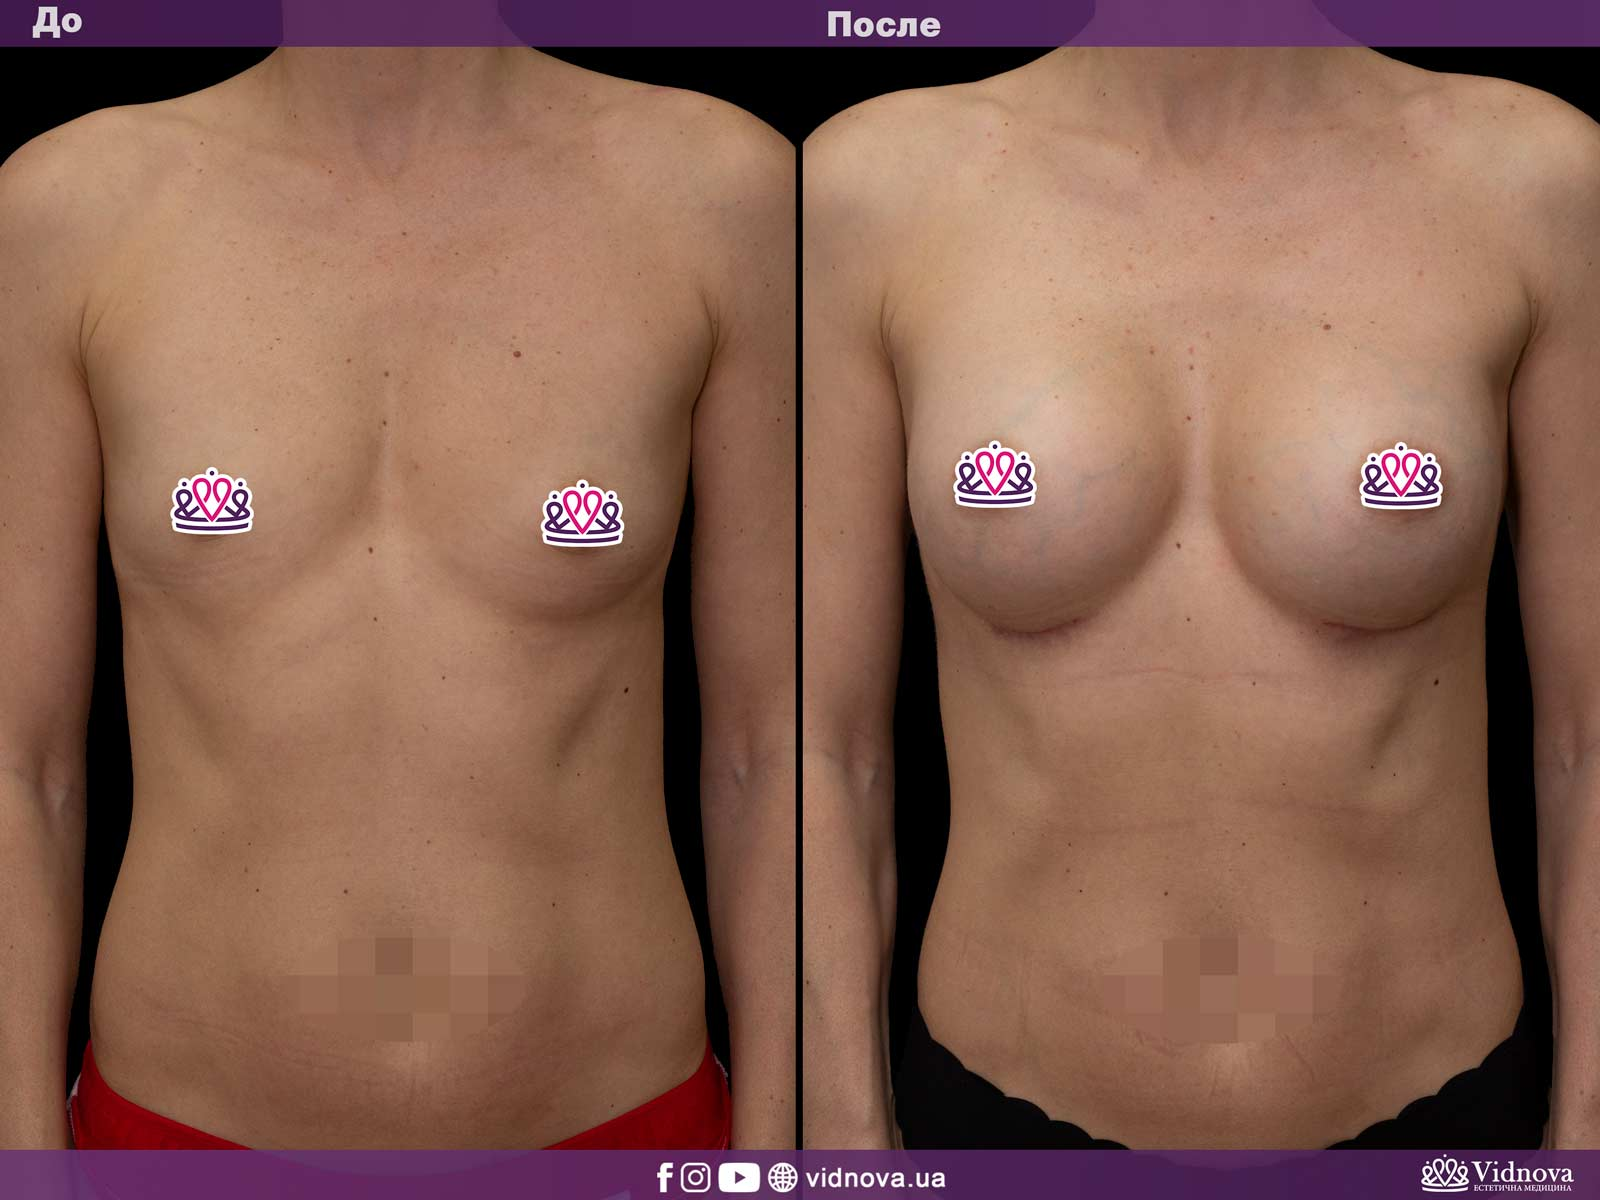 Увеличение груди: Фото ДО и ПОСЛЕ - Пример №16-1 - Клиника Vidnova